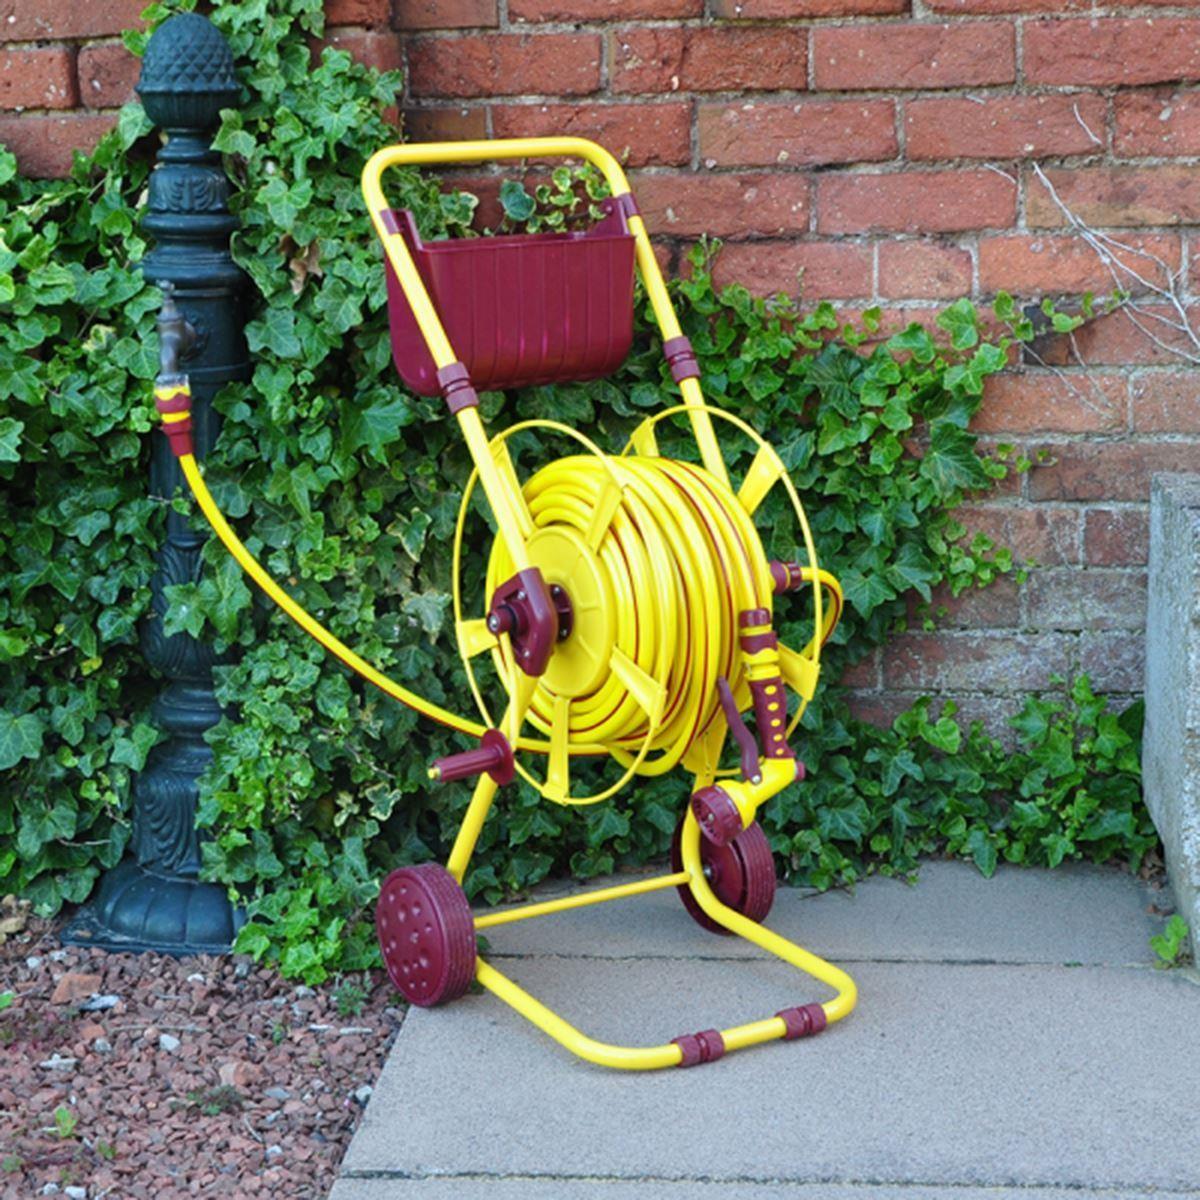 60m Gold Metal Garden Hose Reel Trolley Cart